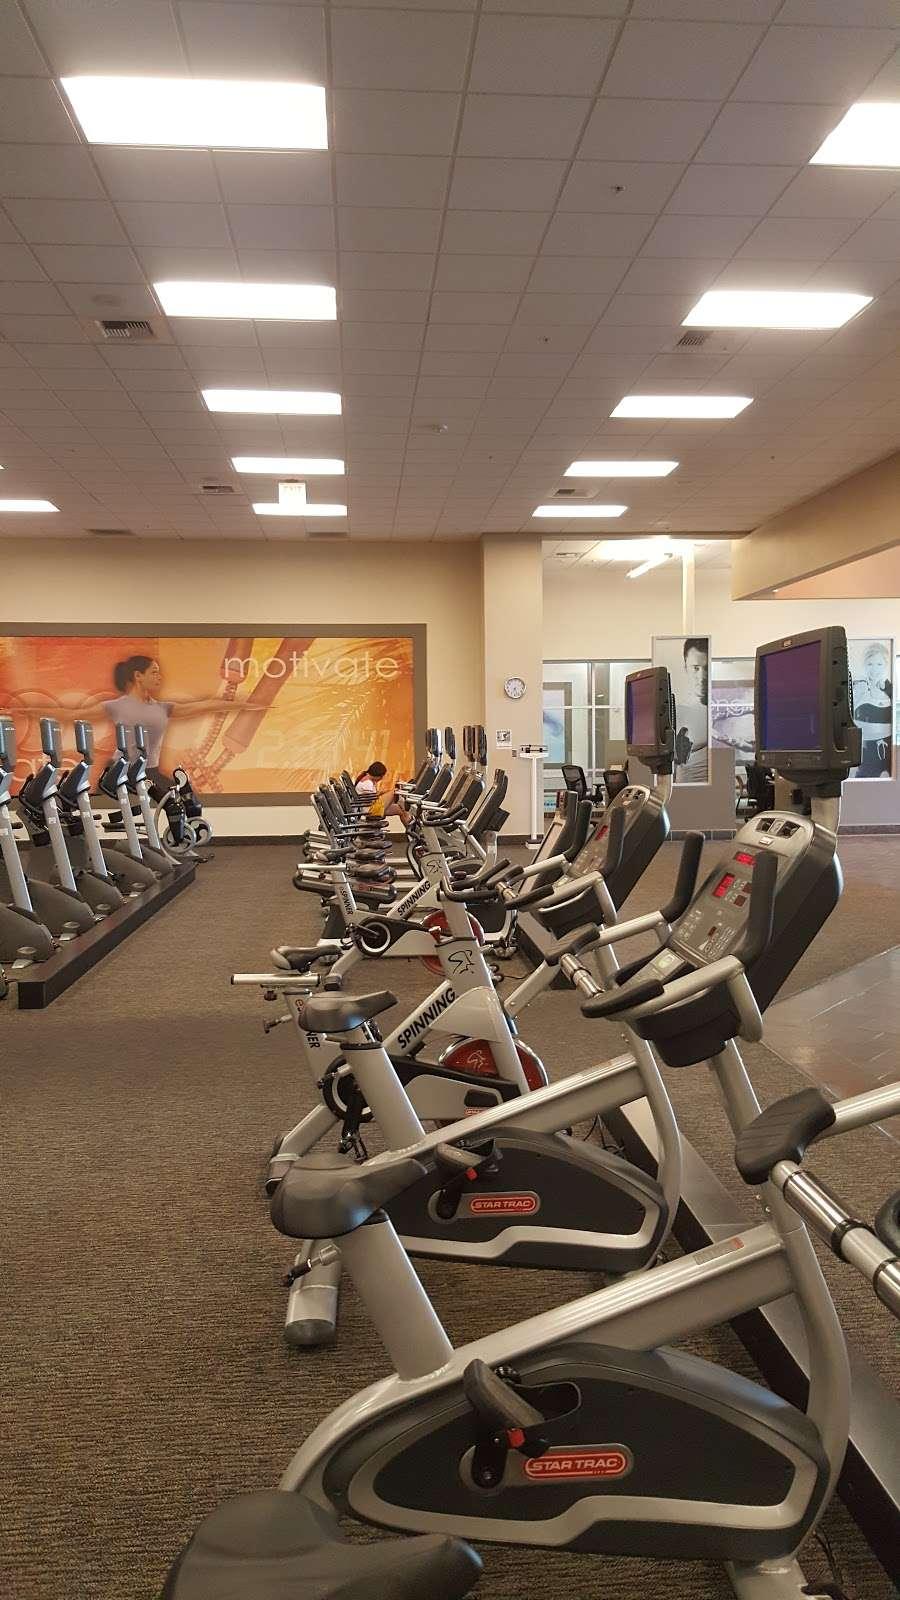 LA Fitness - gym    Photo 1 of 10   Address: 27610 Eucalyptus Ave, Moreno Valley, CA 92555, USA   Phone: (951) 571-8039